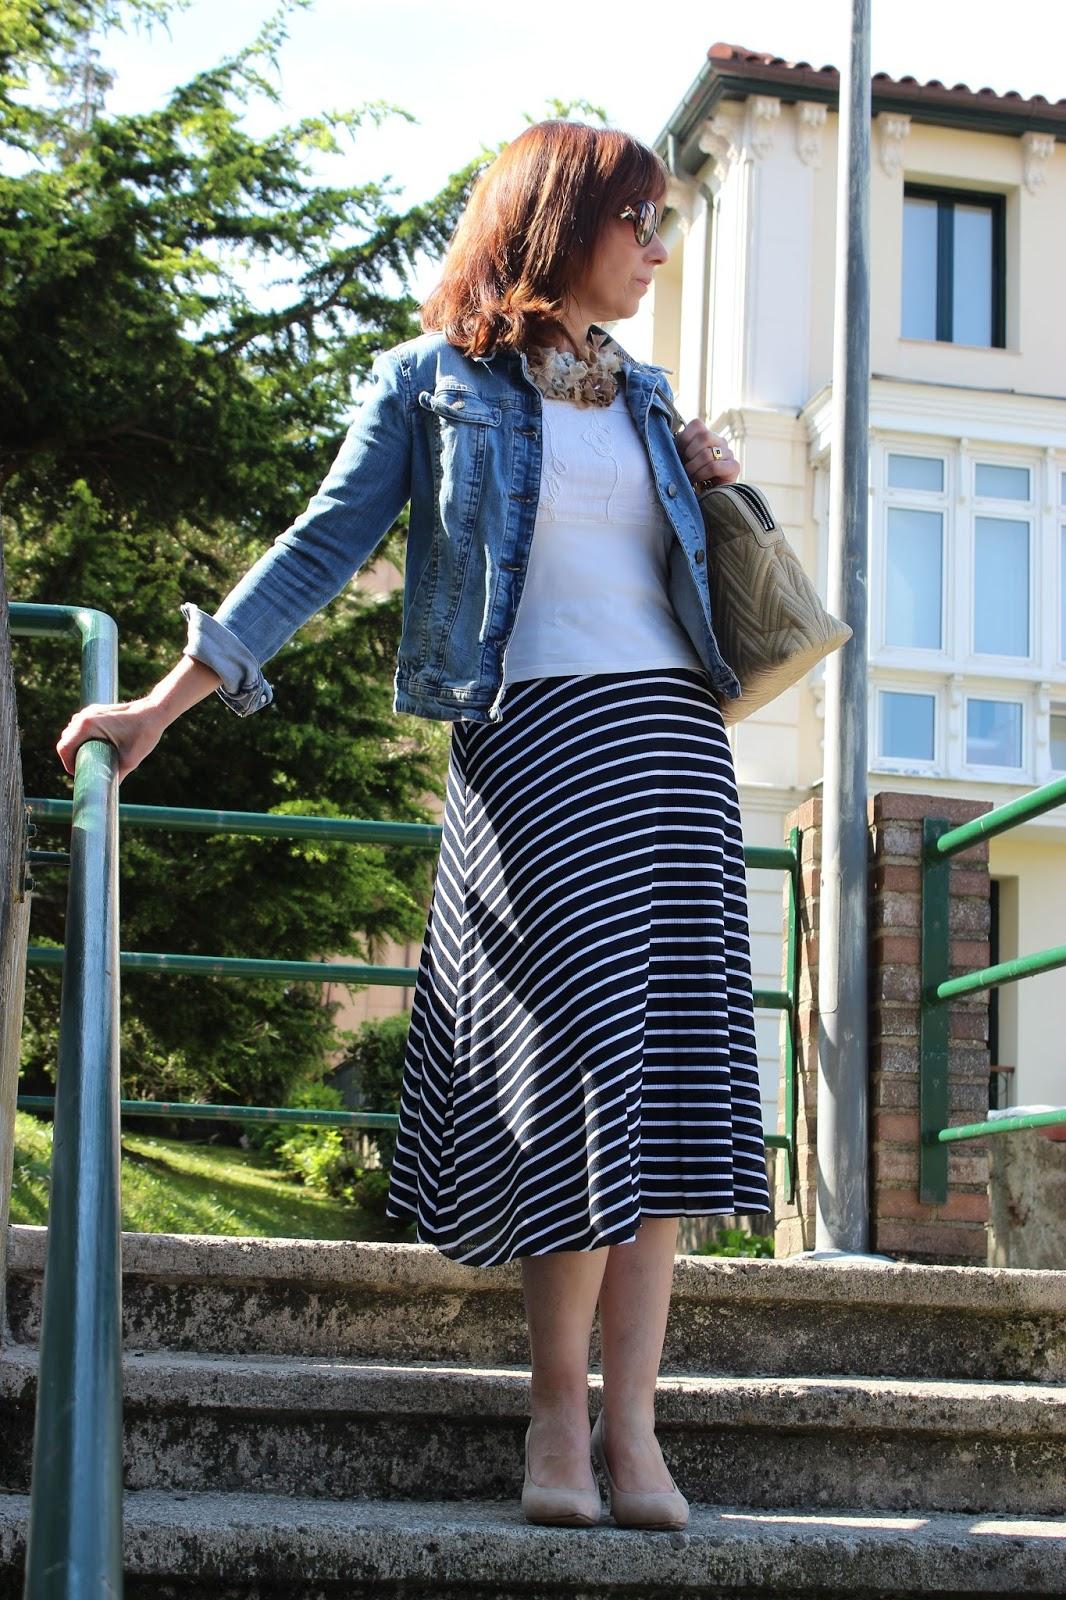 Br jula de estilo mis looks falda marinera - Brujula de estilo ...